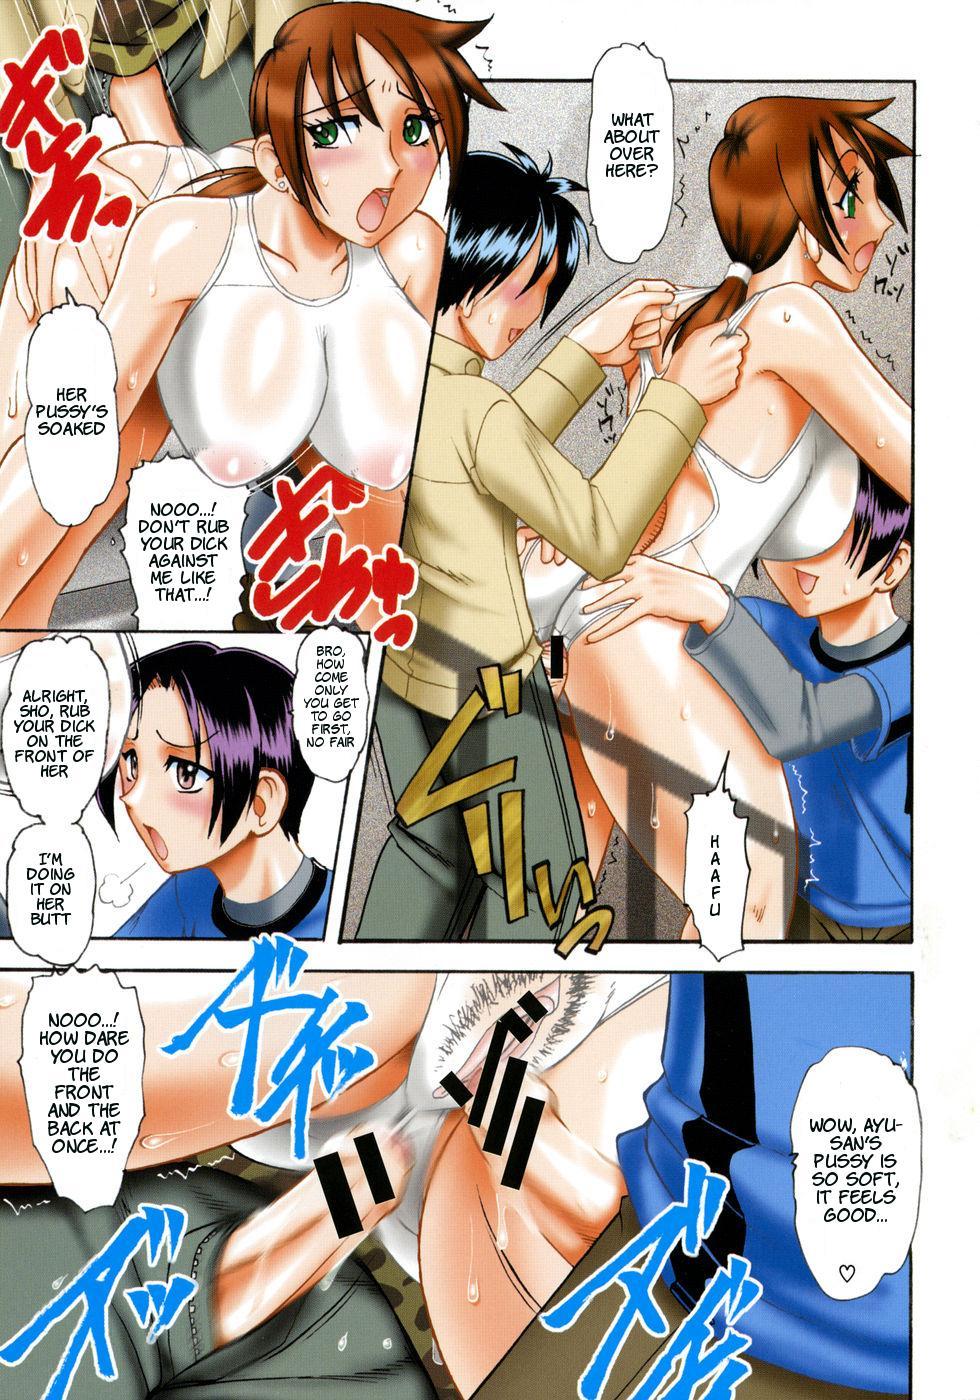 Hadaka Yori Hiwai - She is dirtier than nakedness 6